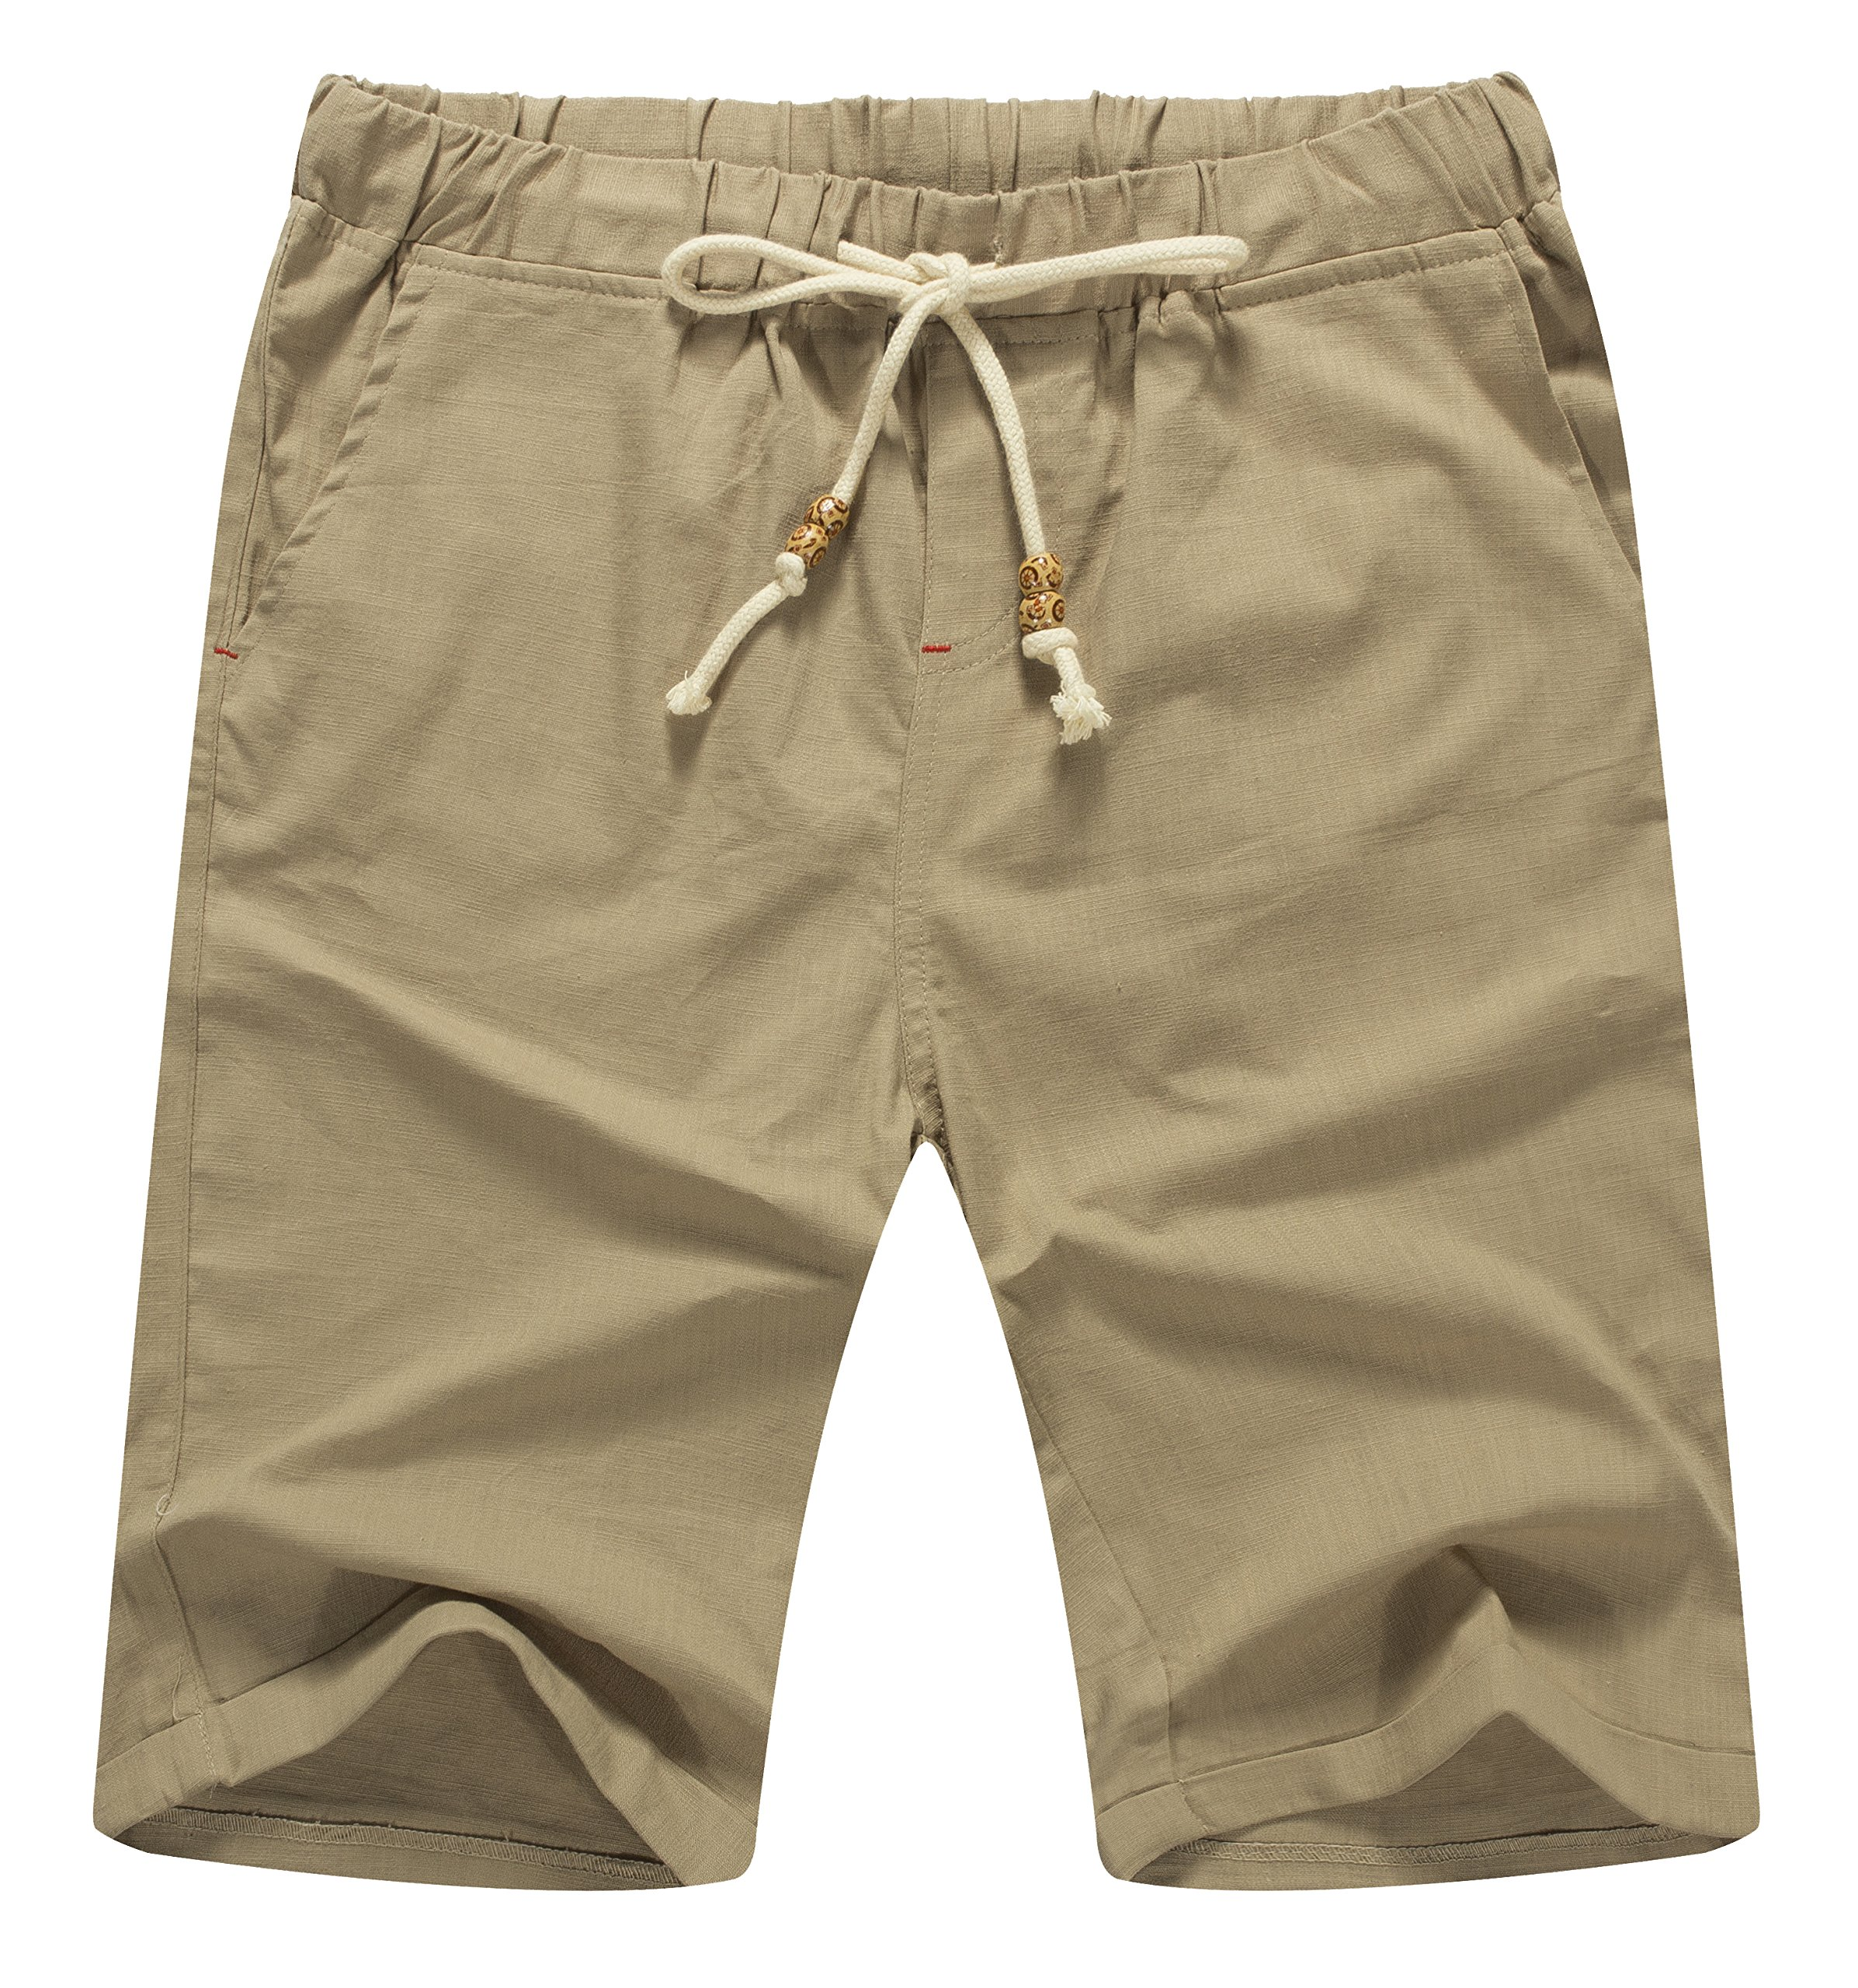 Mr.Zhang Men's Linen Casual Classic Fit Short Summer Beach Shorts Khaki-US M by Mr.Zhang